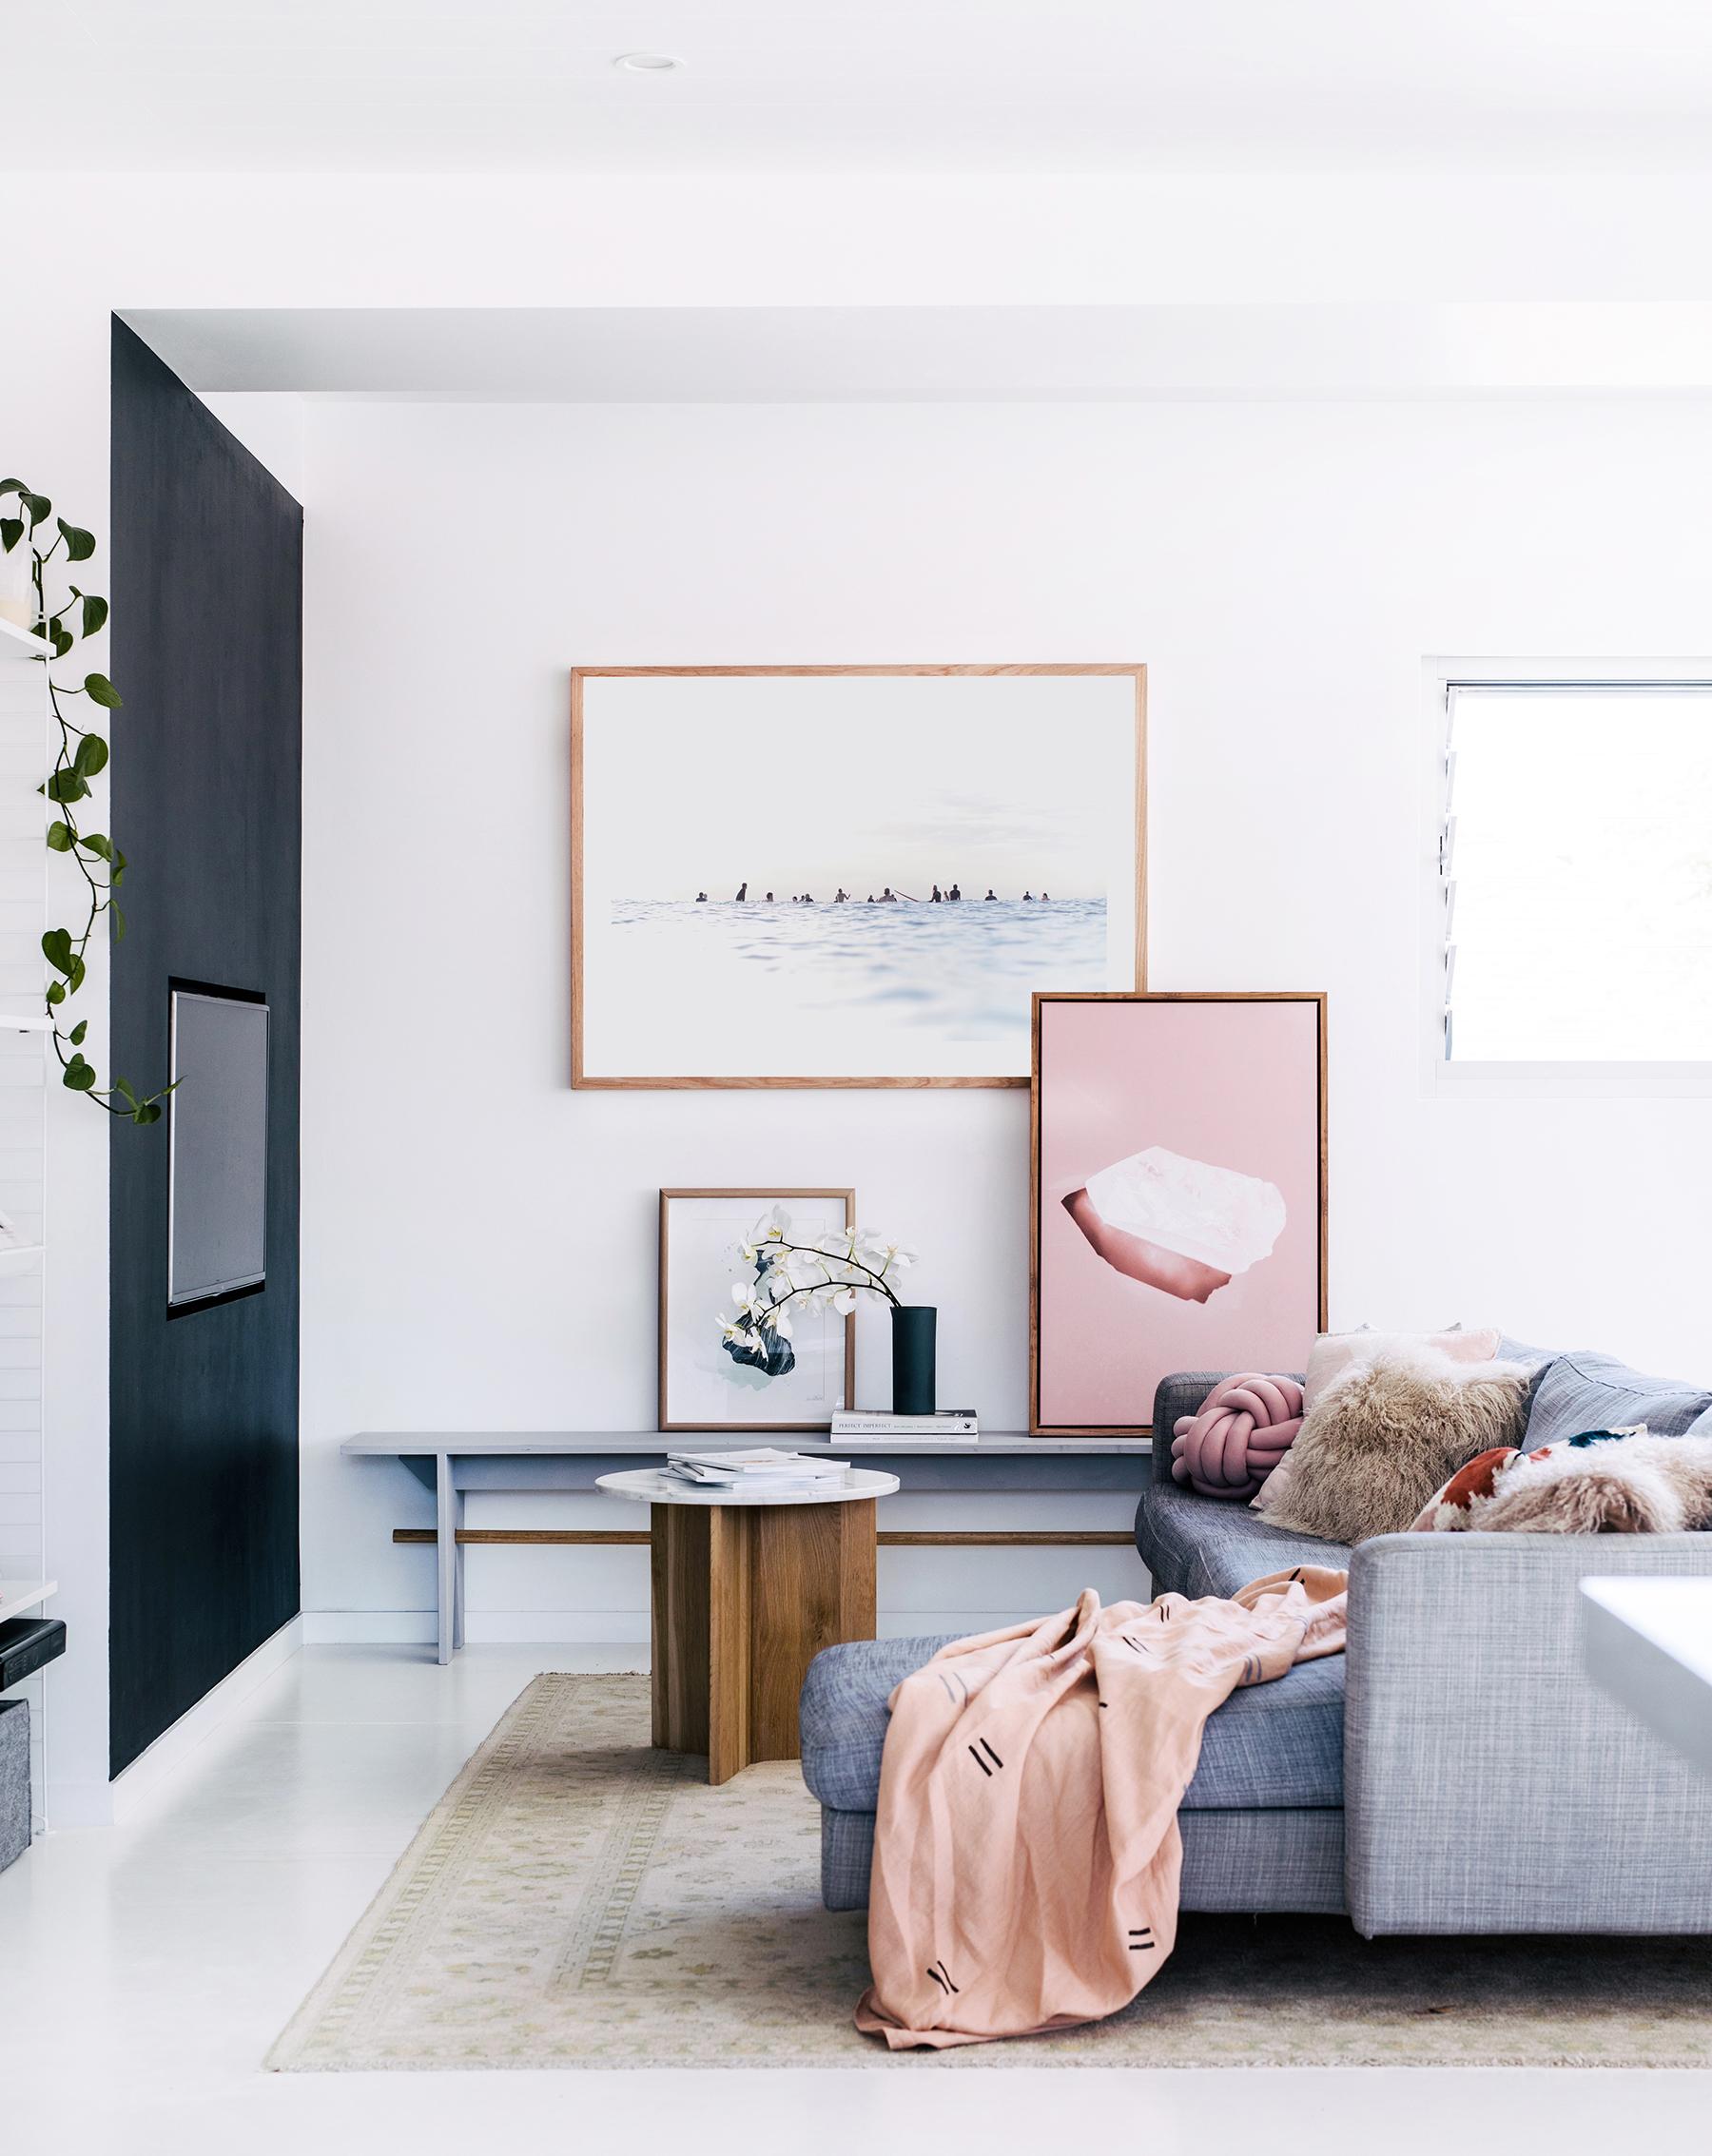 ADORE_home_magazine_nicola_greenaway_home_sydney_living_room_scandi_contemporary_photography_hannah_blackmore.jpg